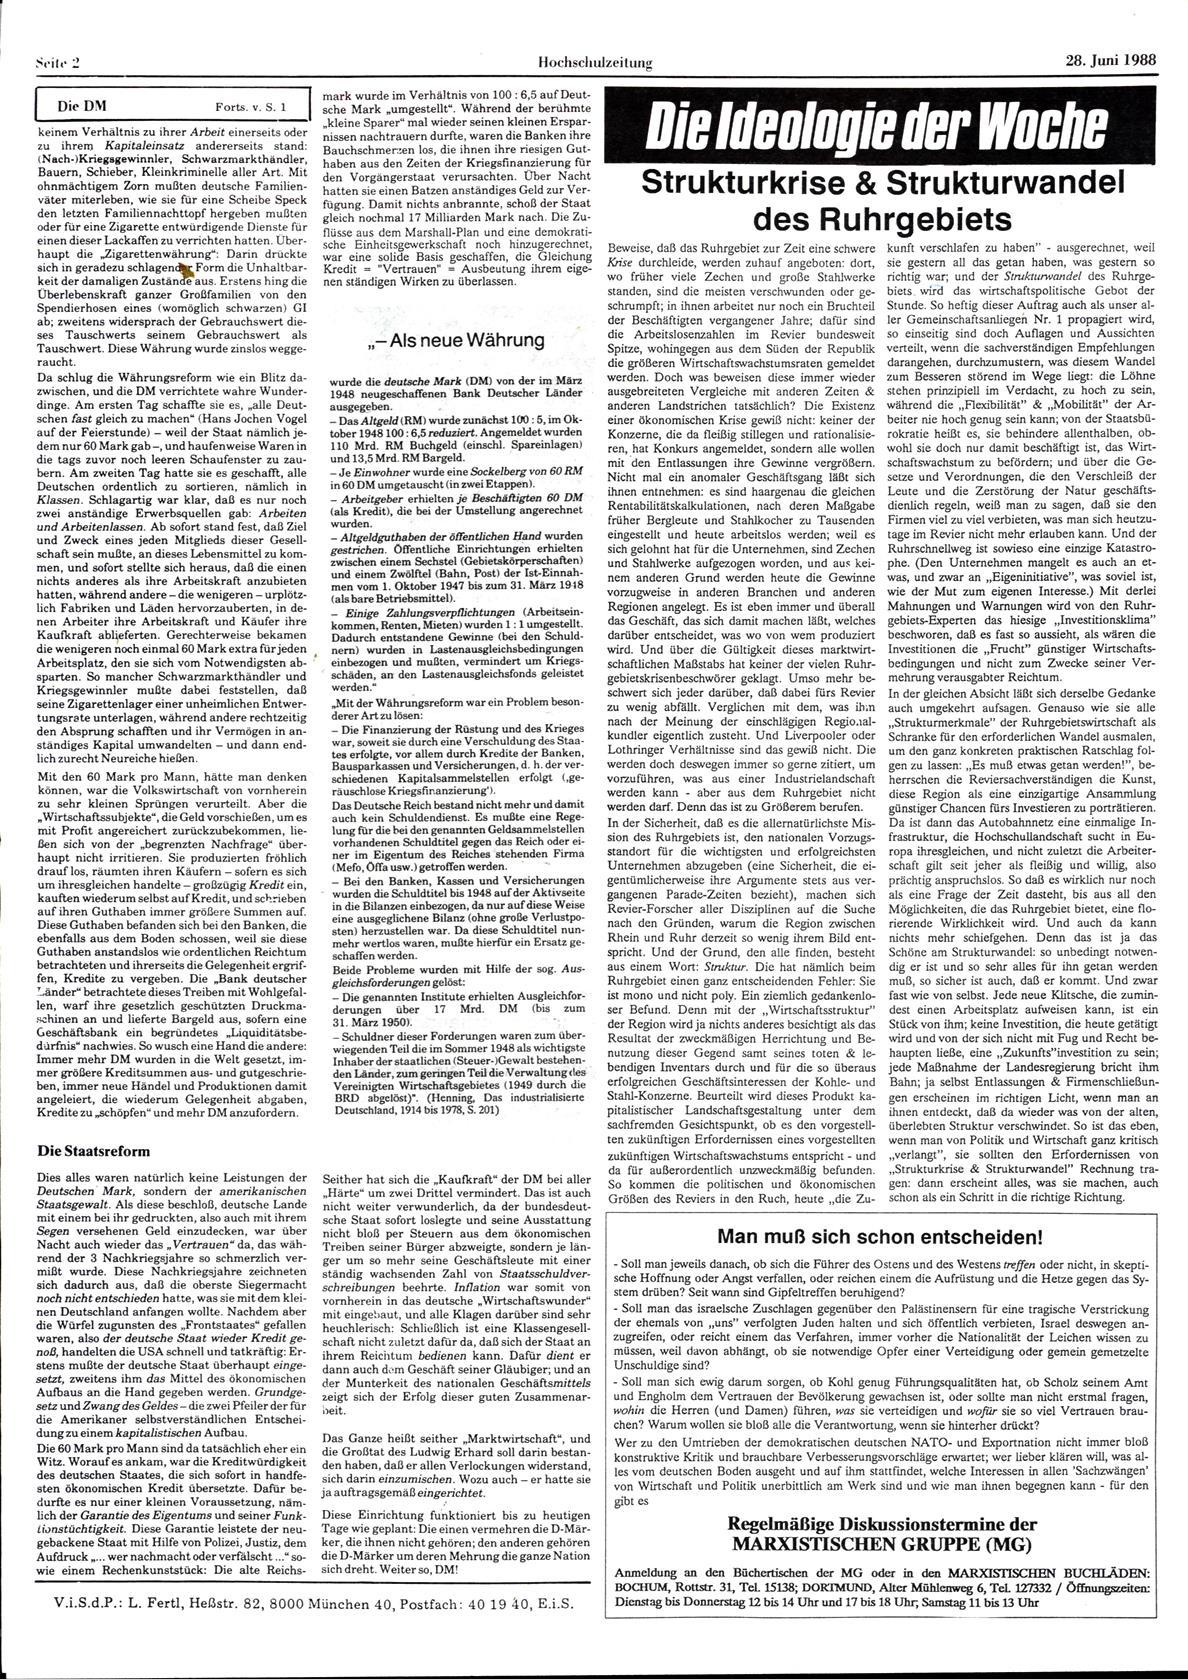 Bochum_BHZ_19880628_174_002